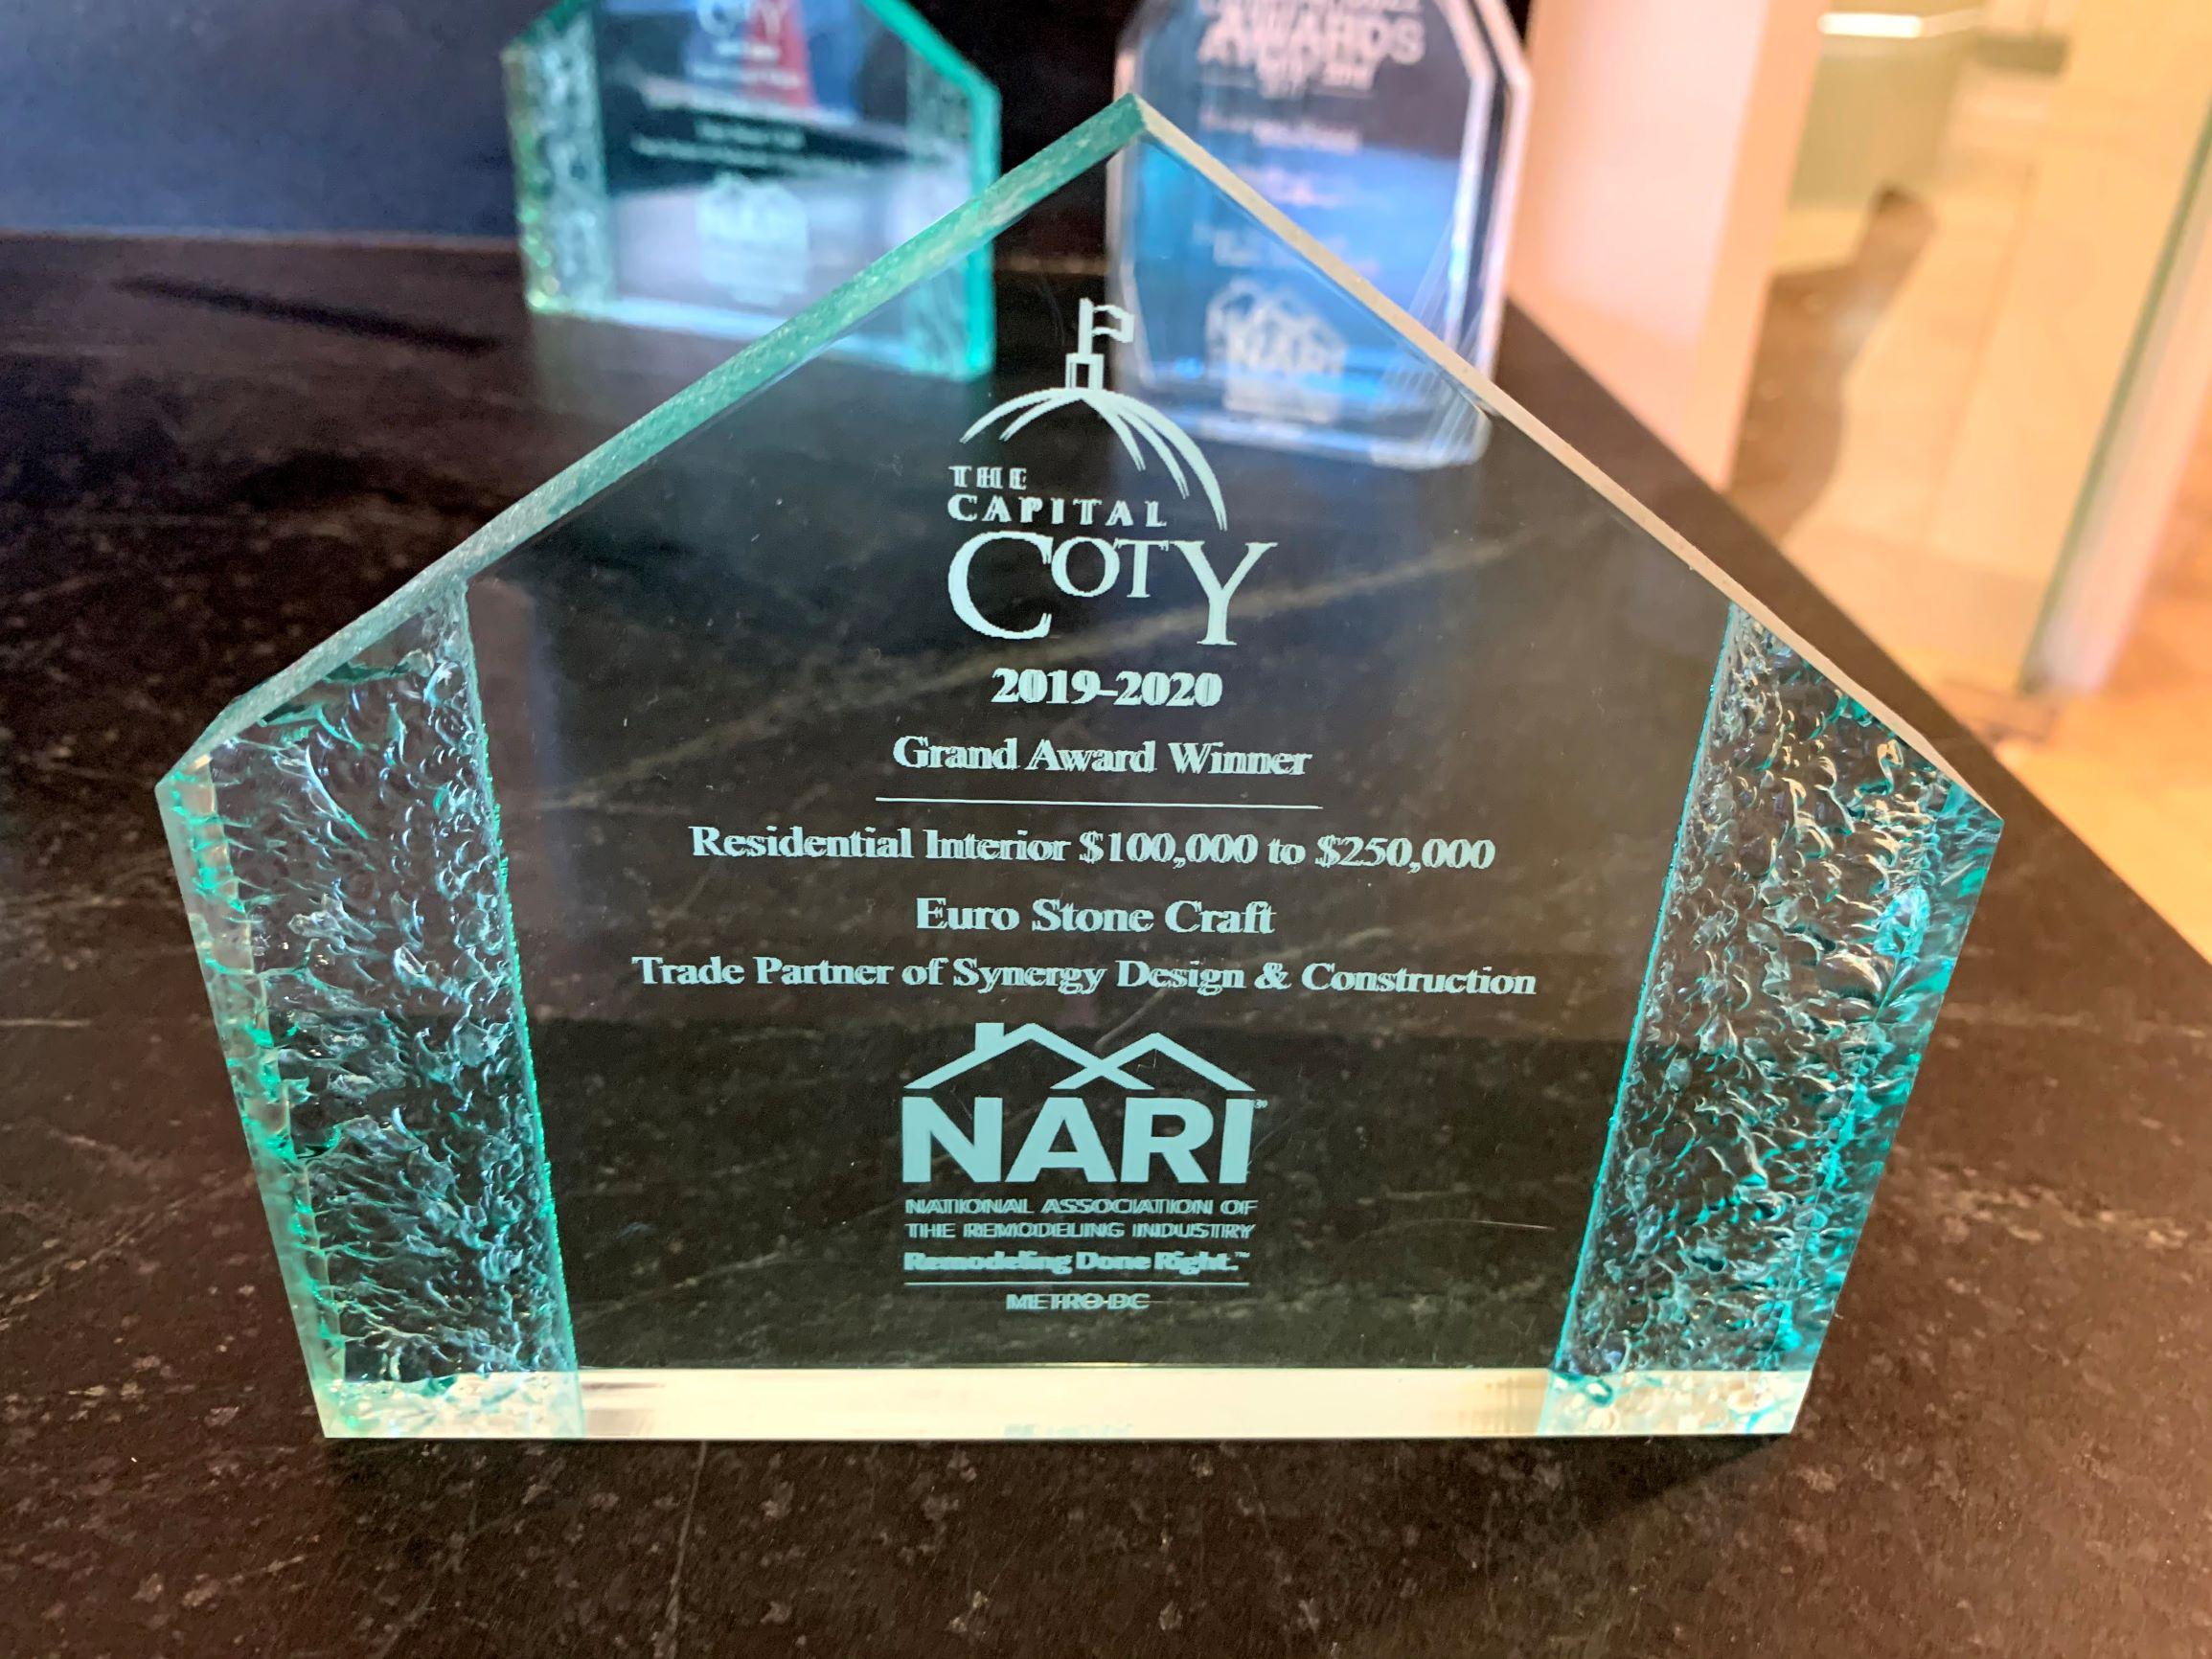 ESC Coty Award 2019-2020 Residential Interrior Synergy